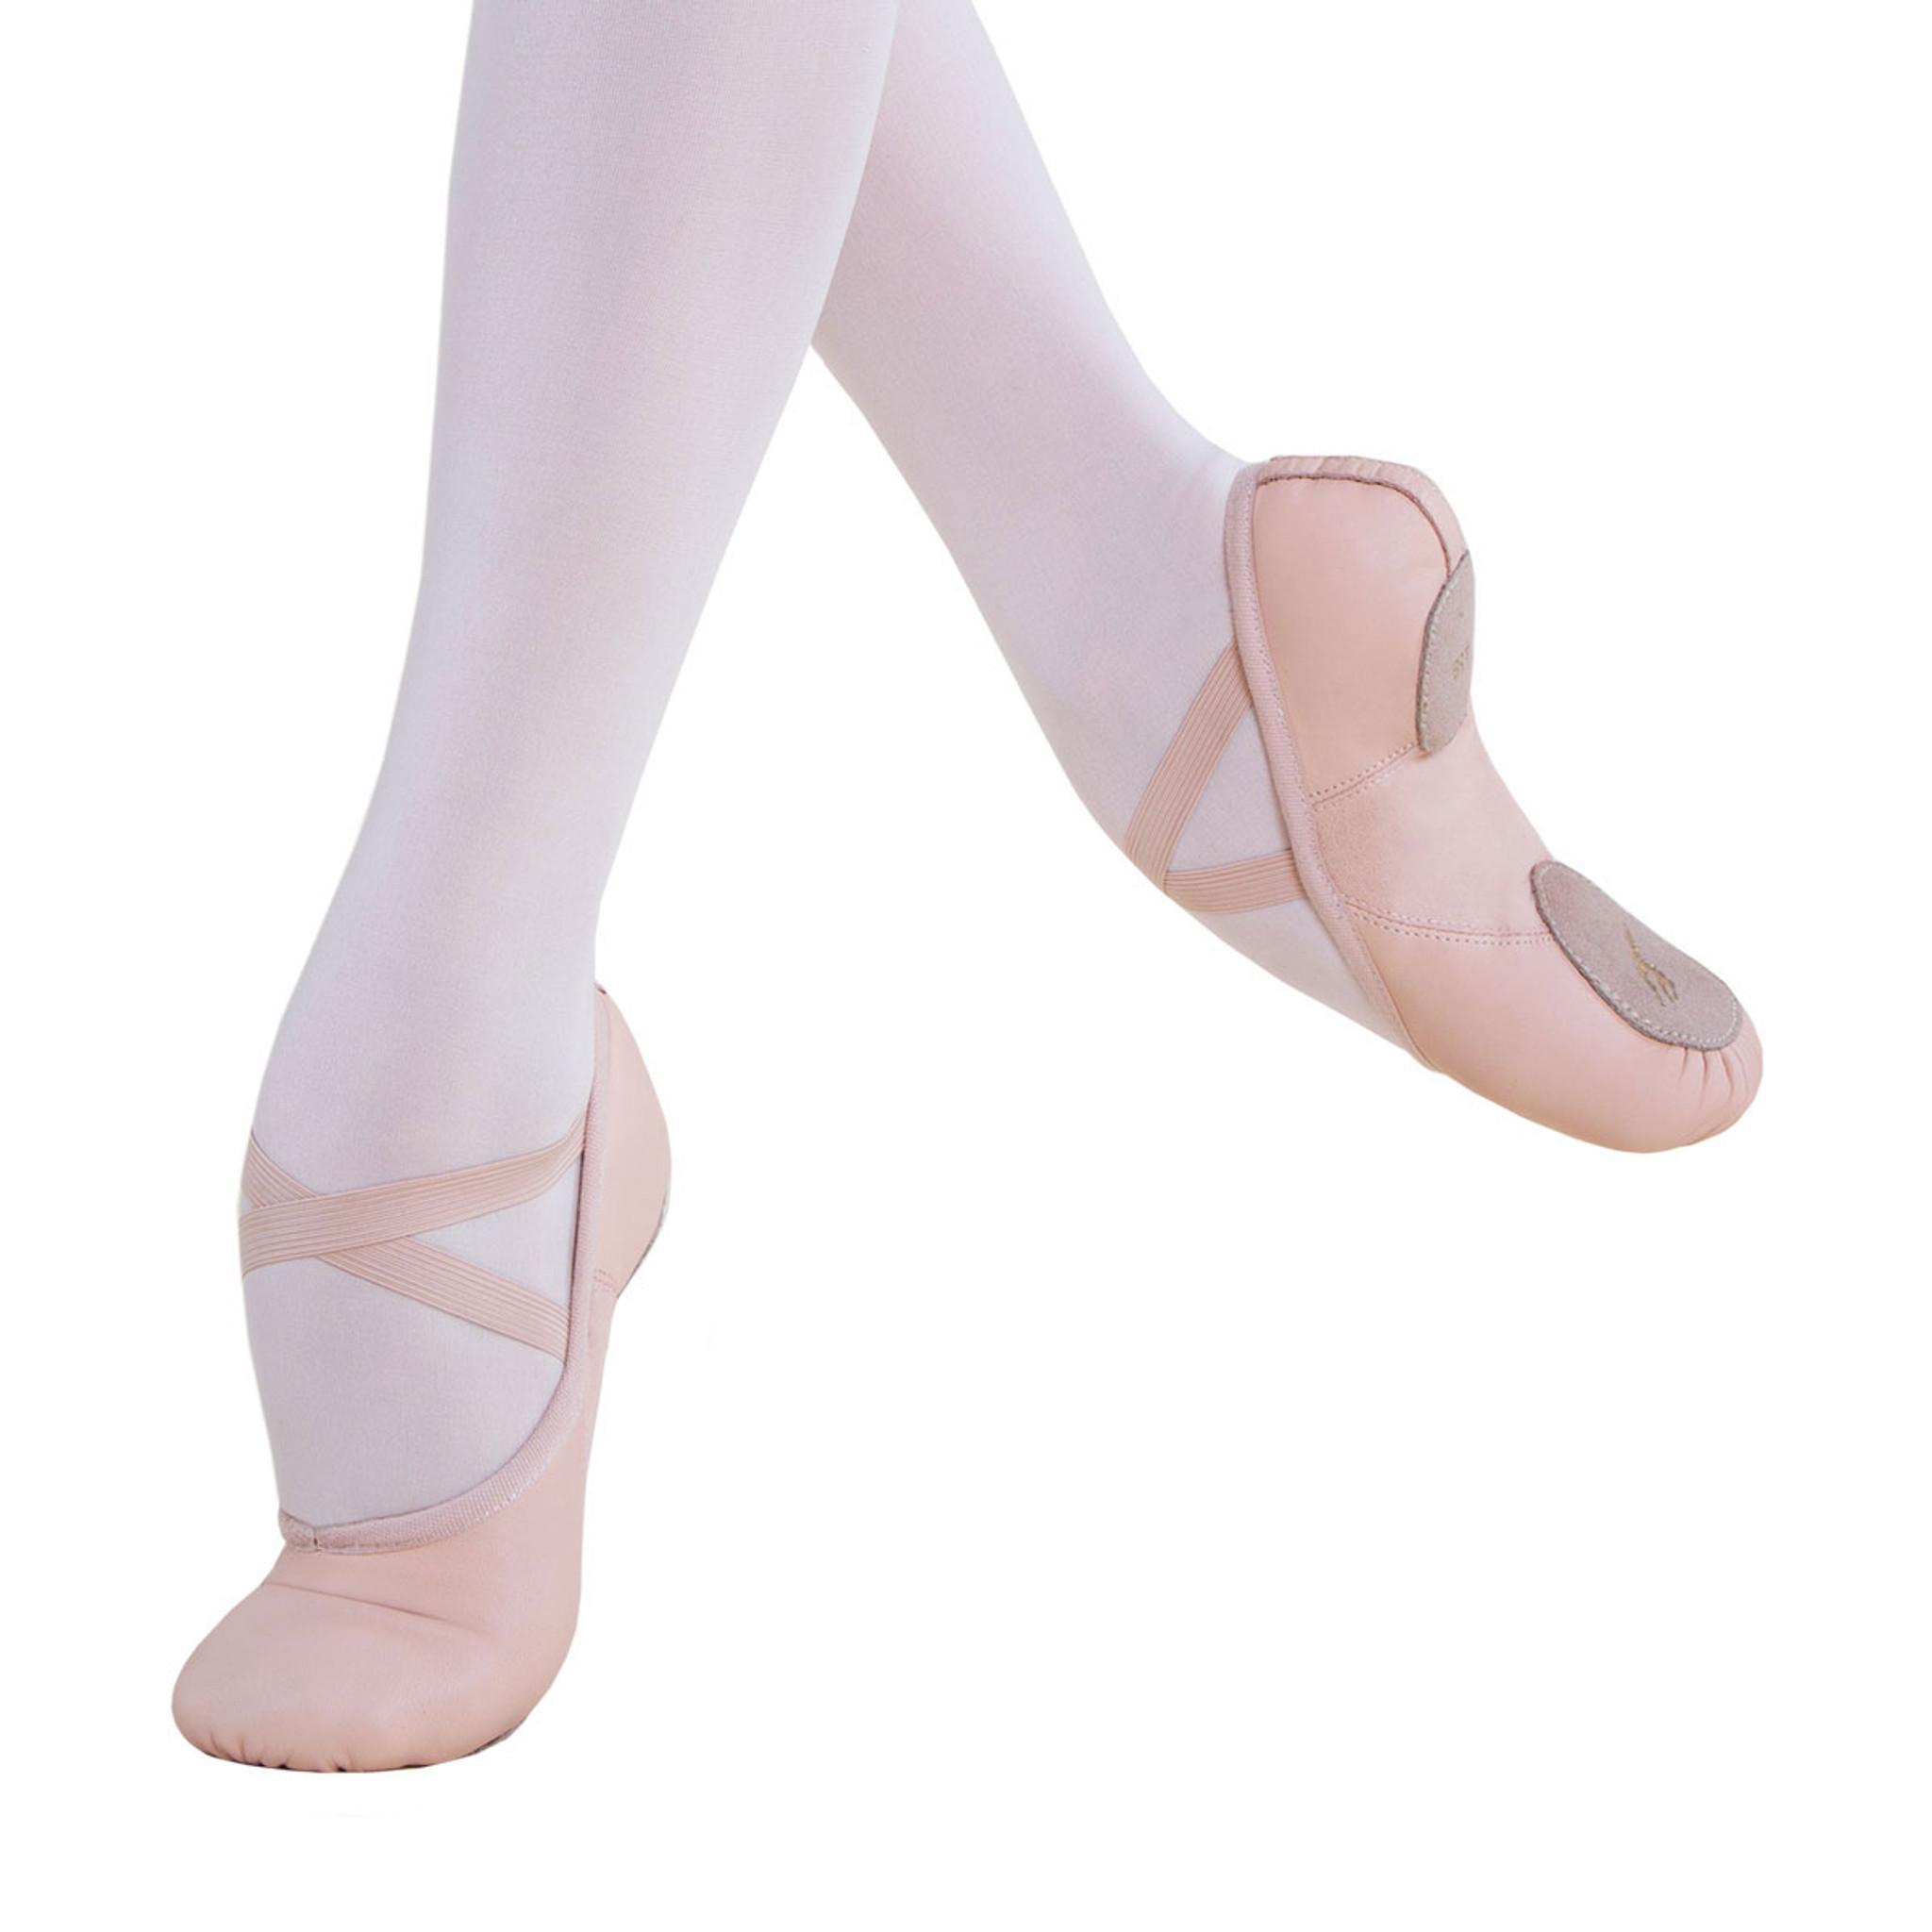 Energetiks Revelation Ballet Shoe - Mesh Split Sole Child